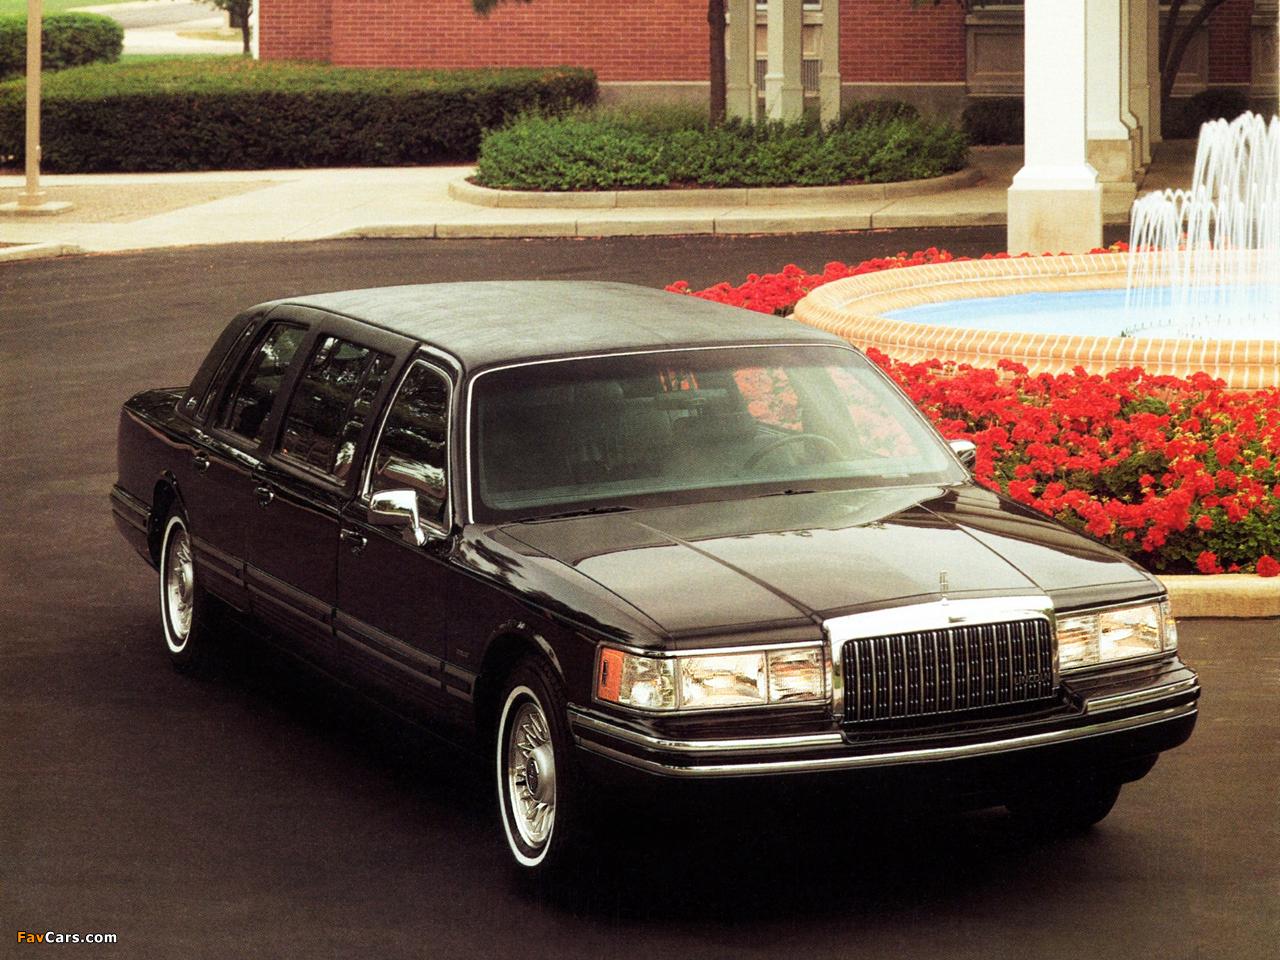 Photos Of Lincoln Town Car 6 Door Limousine 1992 94 1280x960